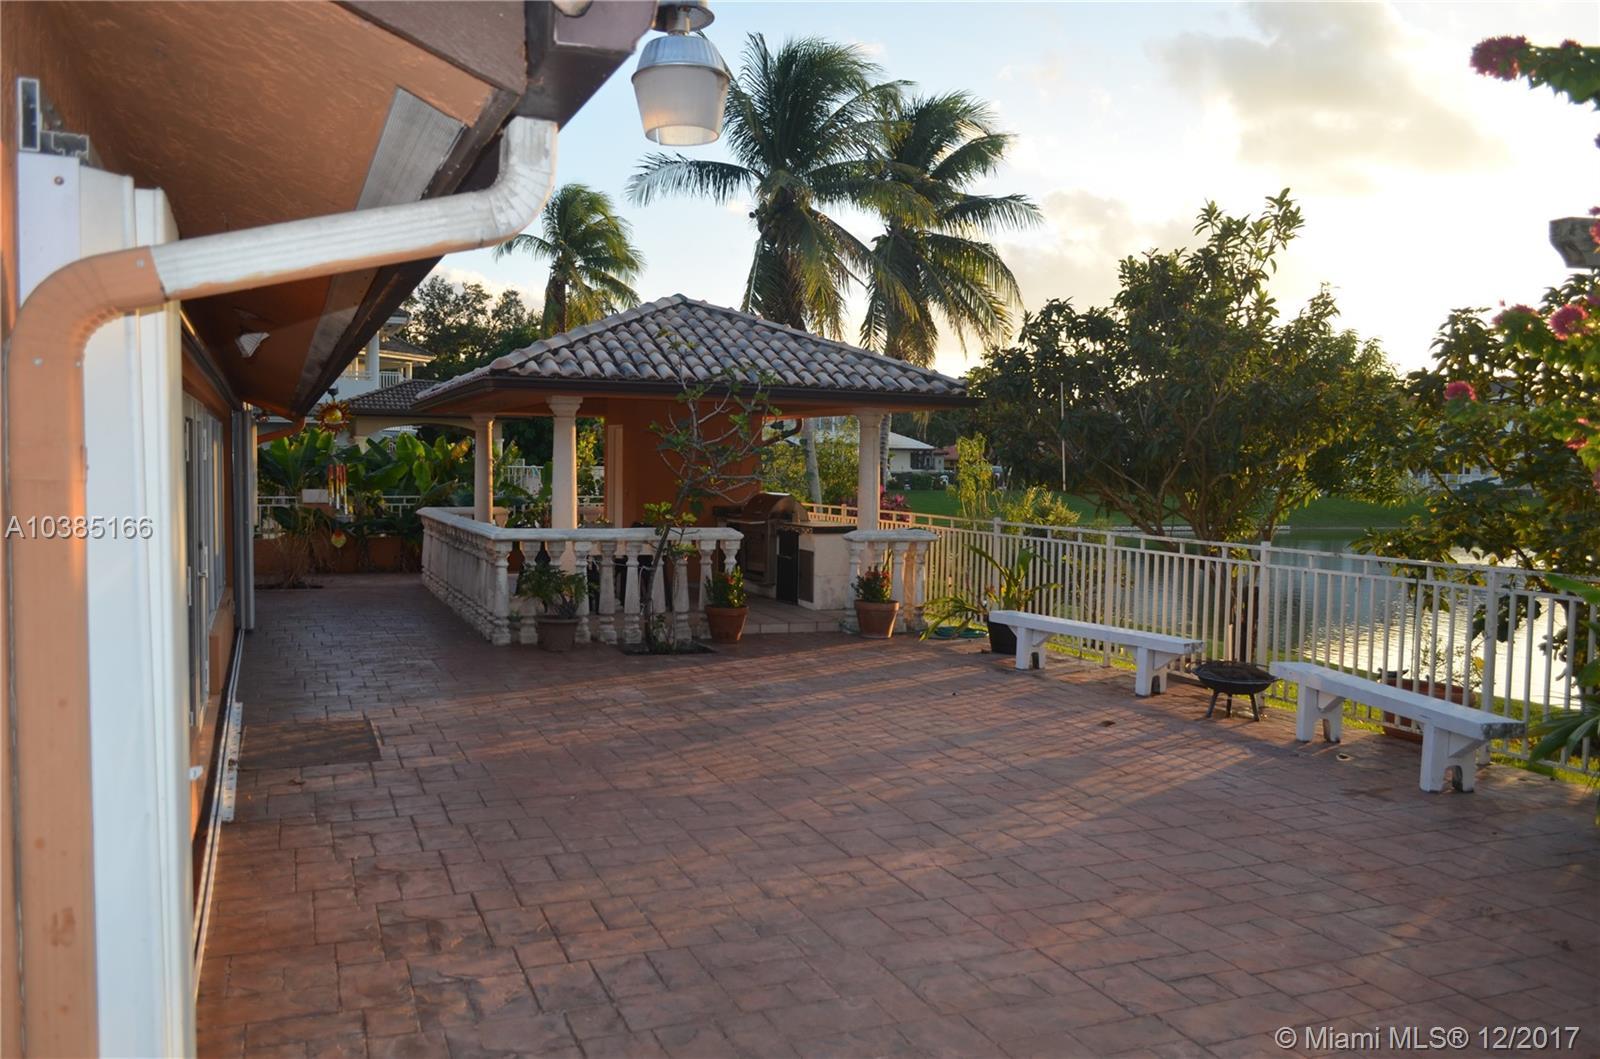 14352 Ardoch Pl, Miami Lakes FL, 33016